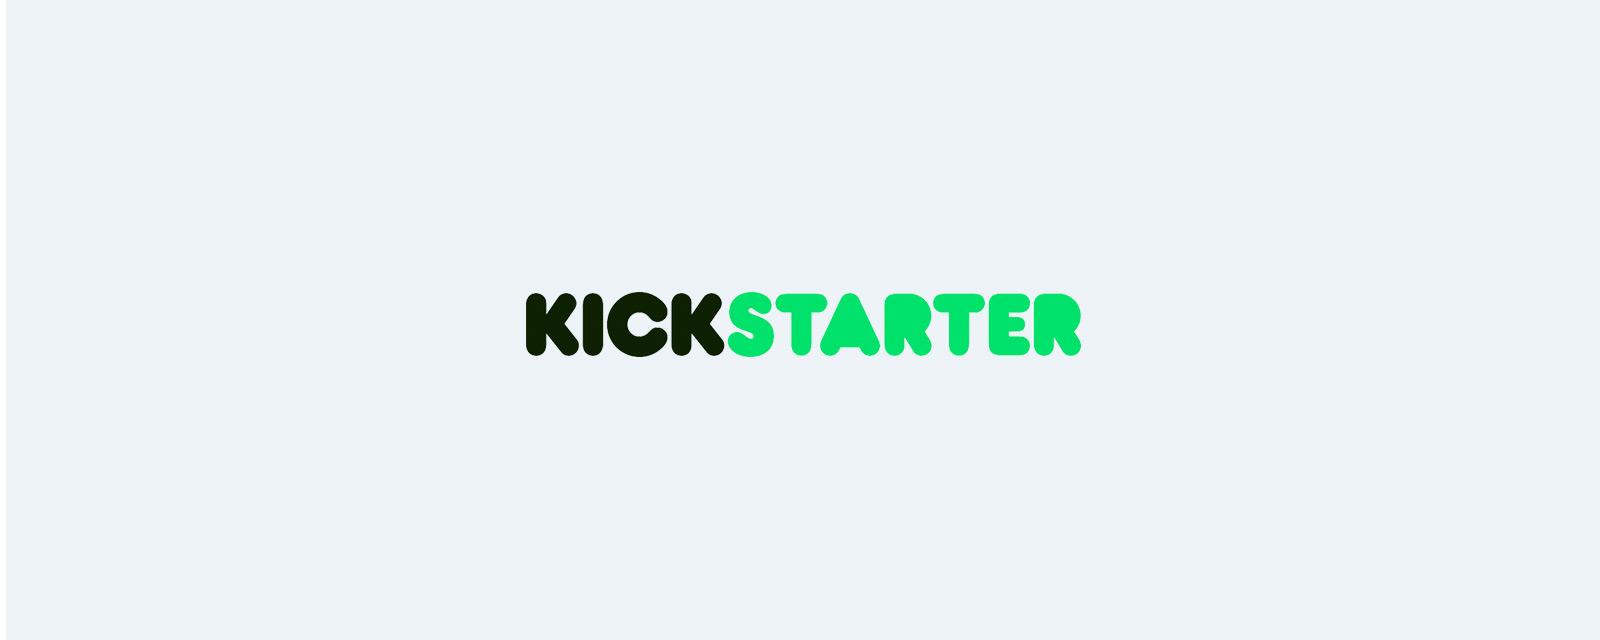 Learn why Kickstarter is a great GoFundMe alternative.